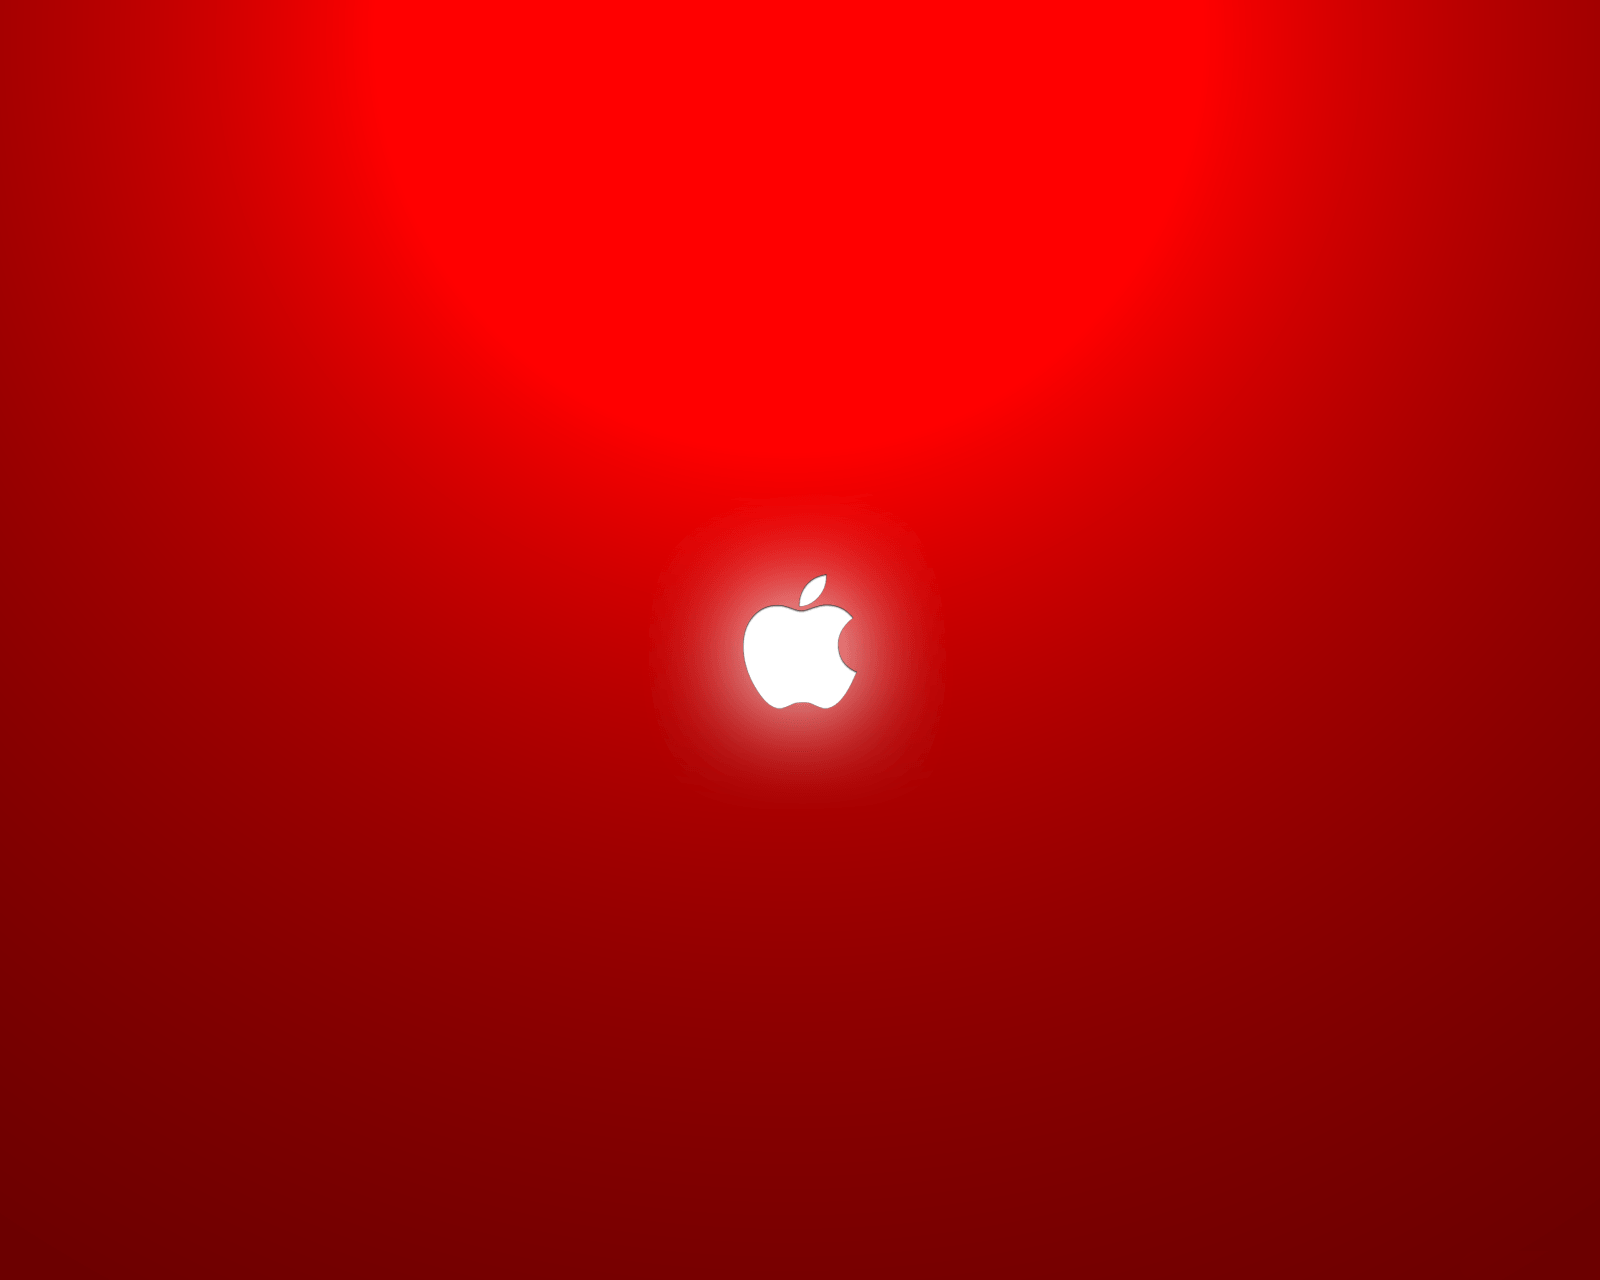 Red photos